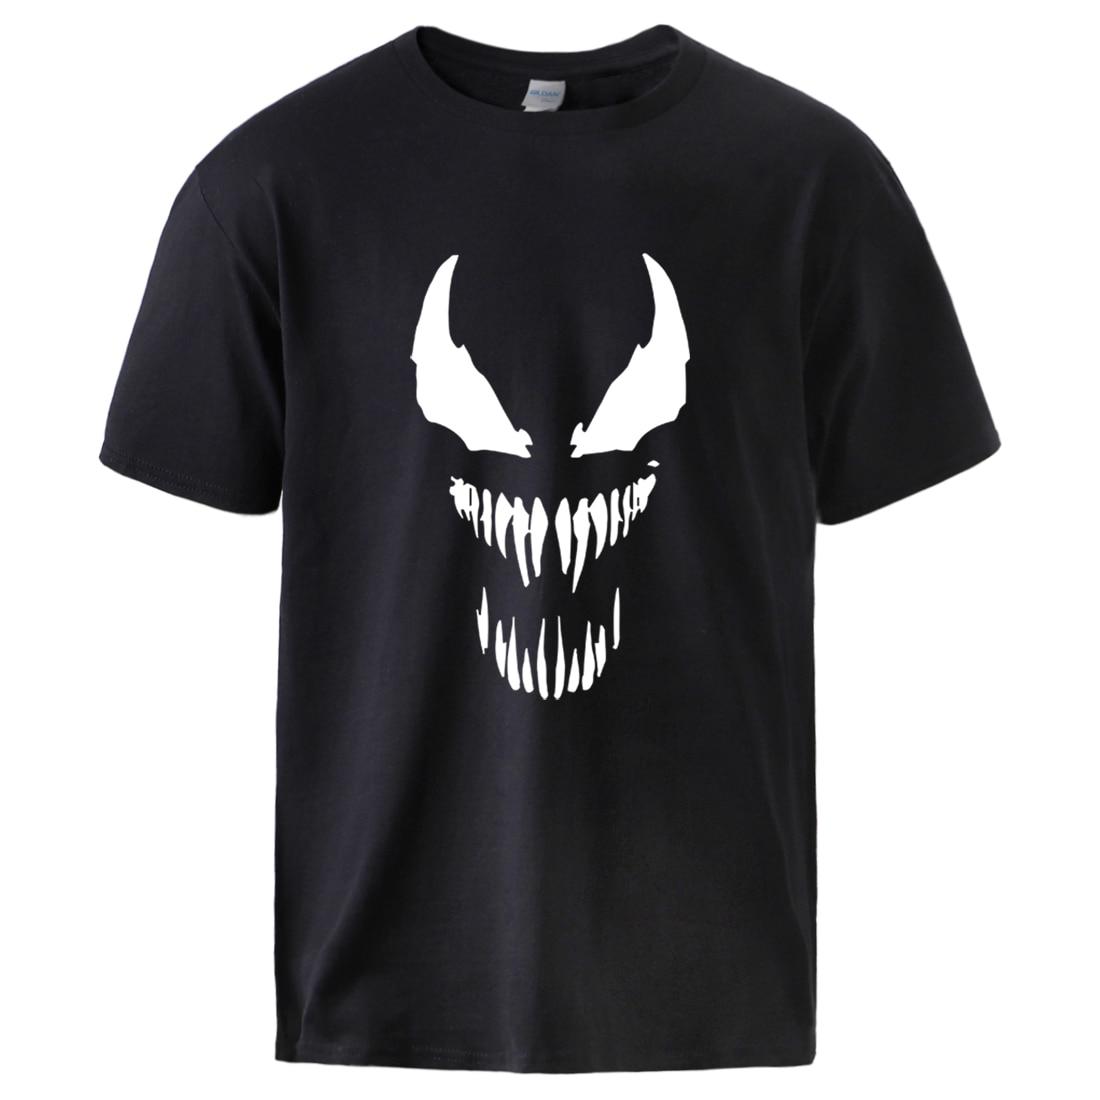 Marvel Superhero Men's T Shirts Summer Cotton Sportswear Casual Tee 2020 Male Hot Sell Short Sleeve Streetwear Crewneck T Shirts